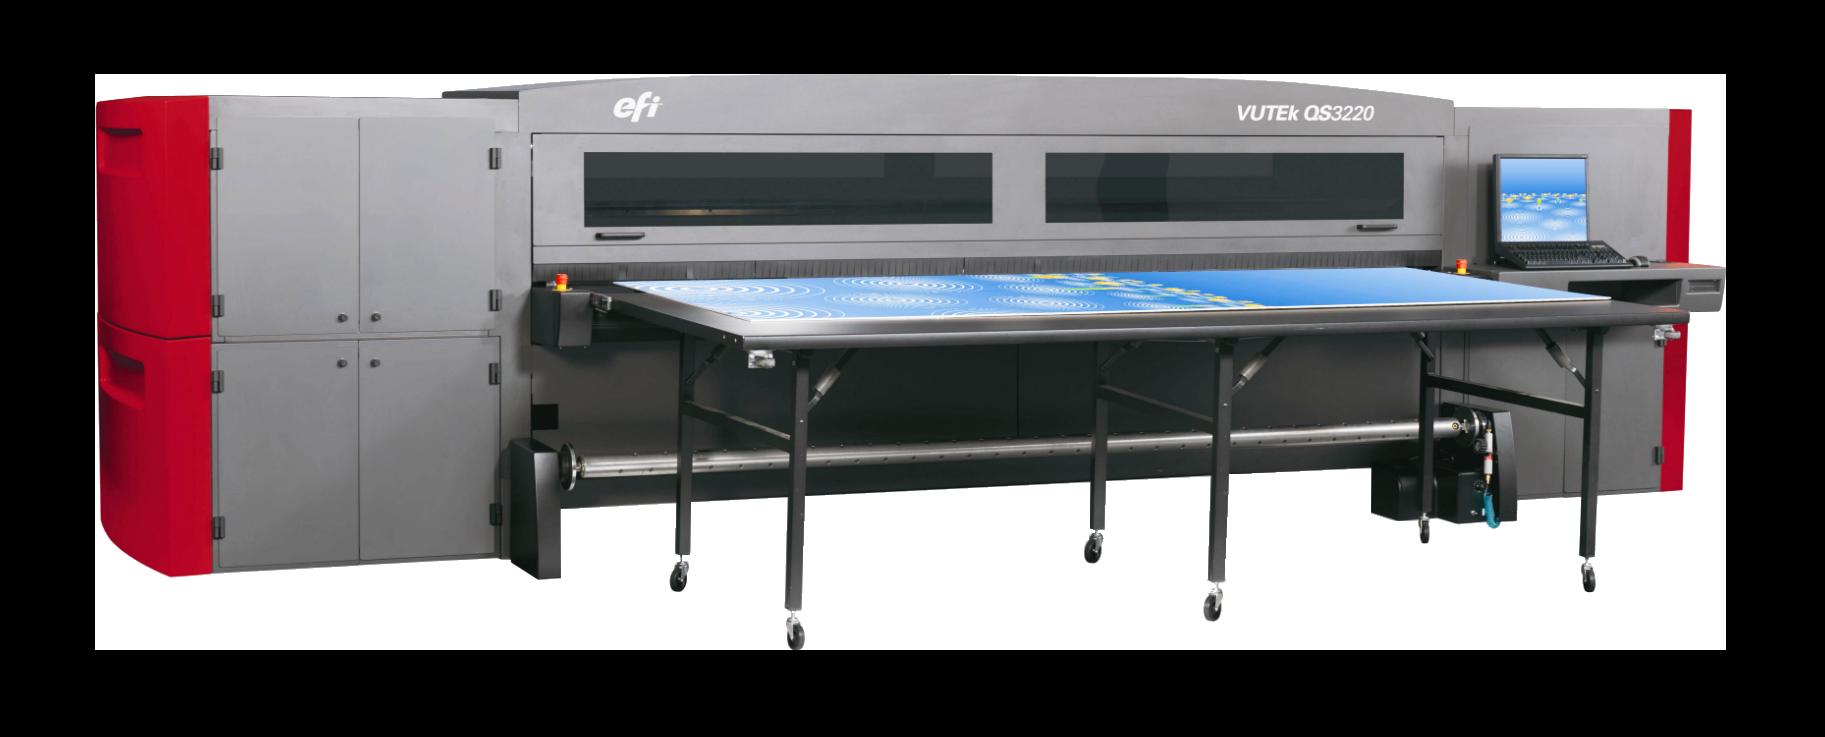 efi Vutek Super Wide Format printer